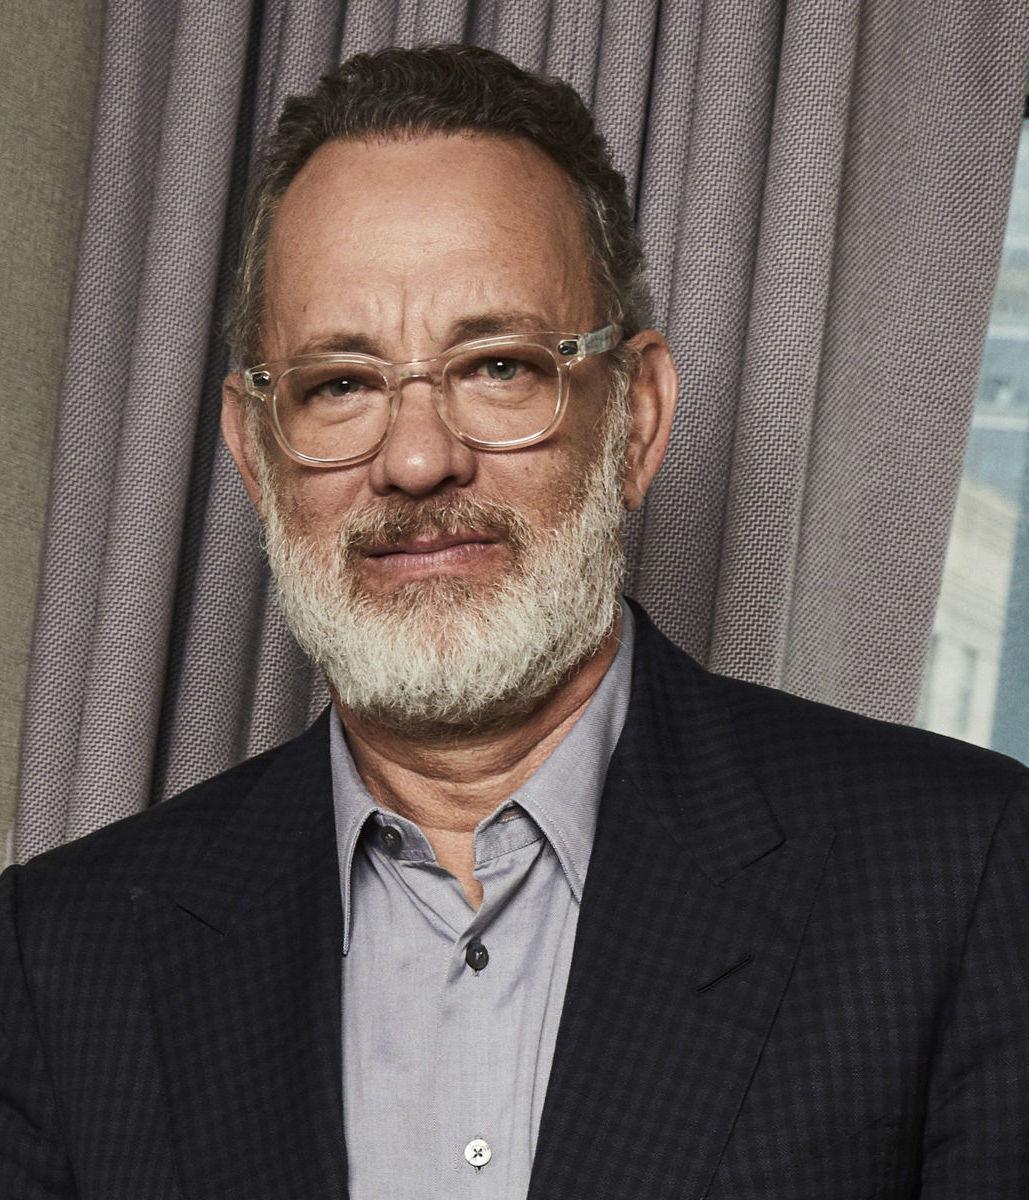 Herec Tom Hanks na promozábere k novému filmu...